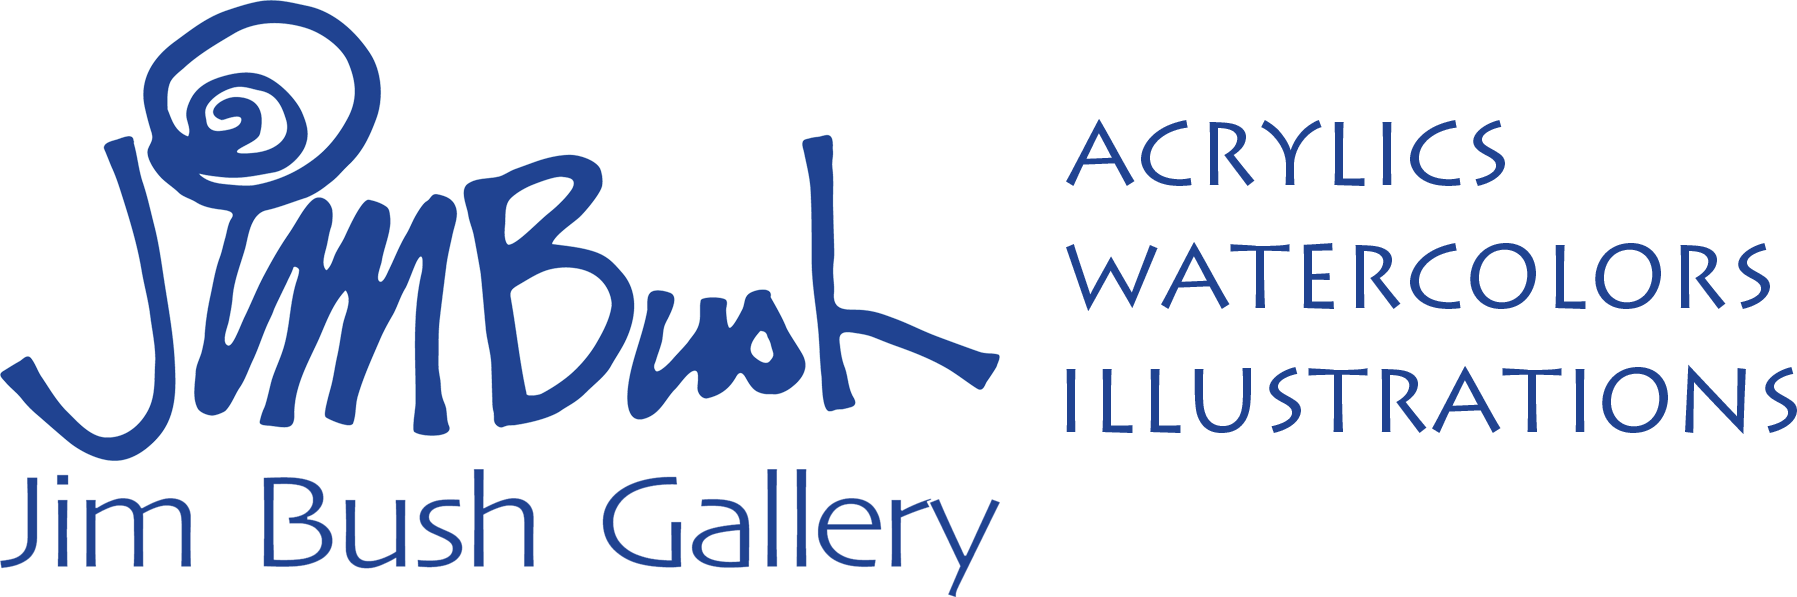 Jim Bush Art